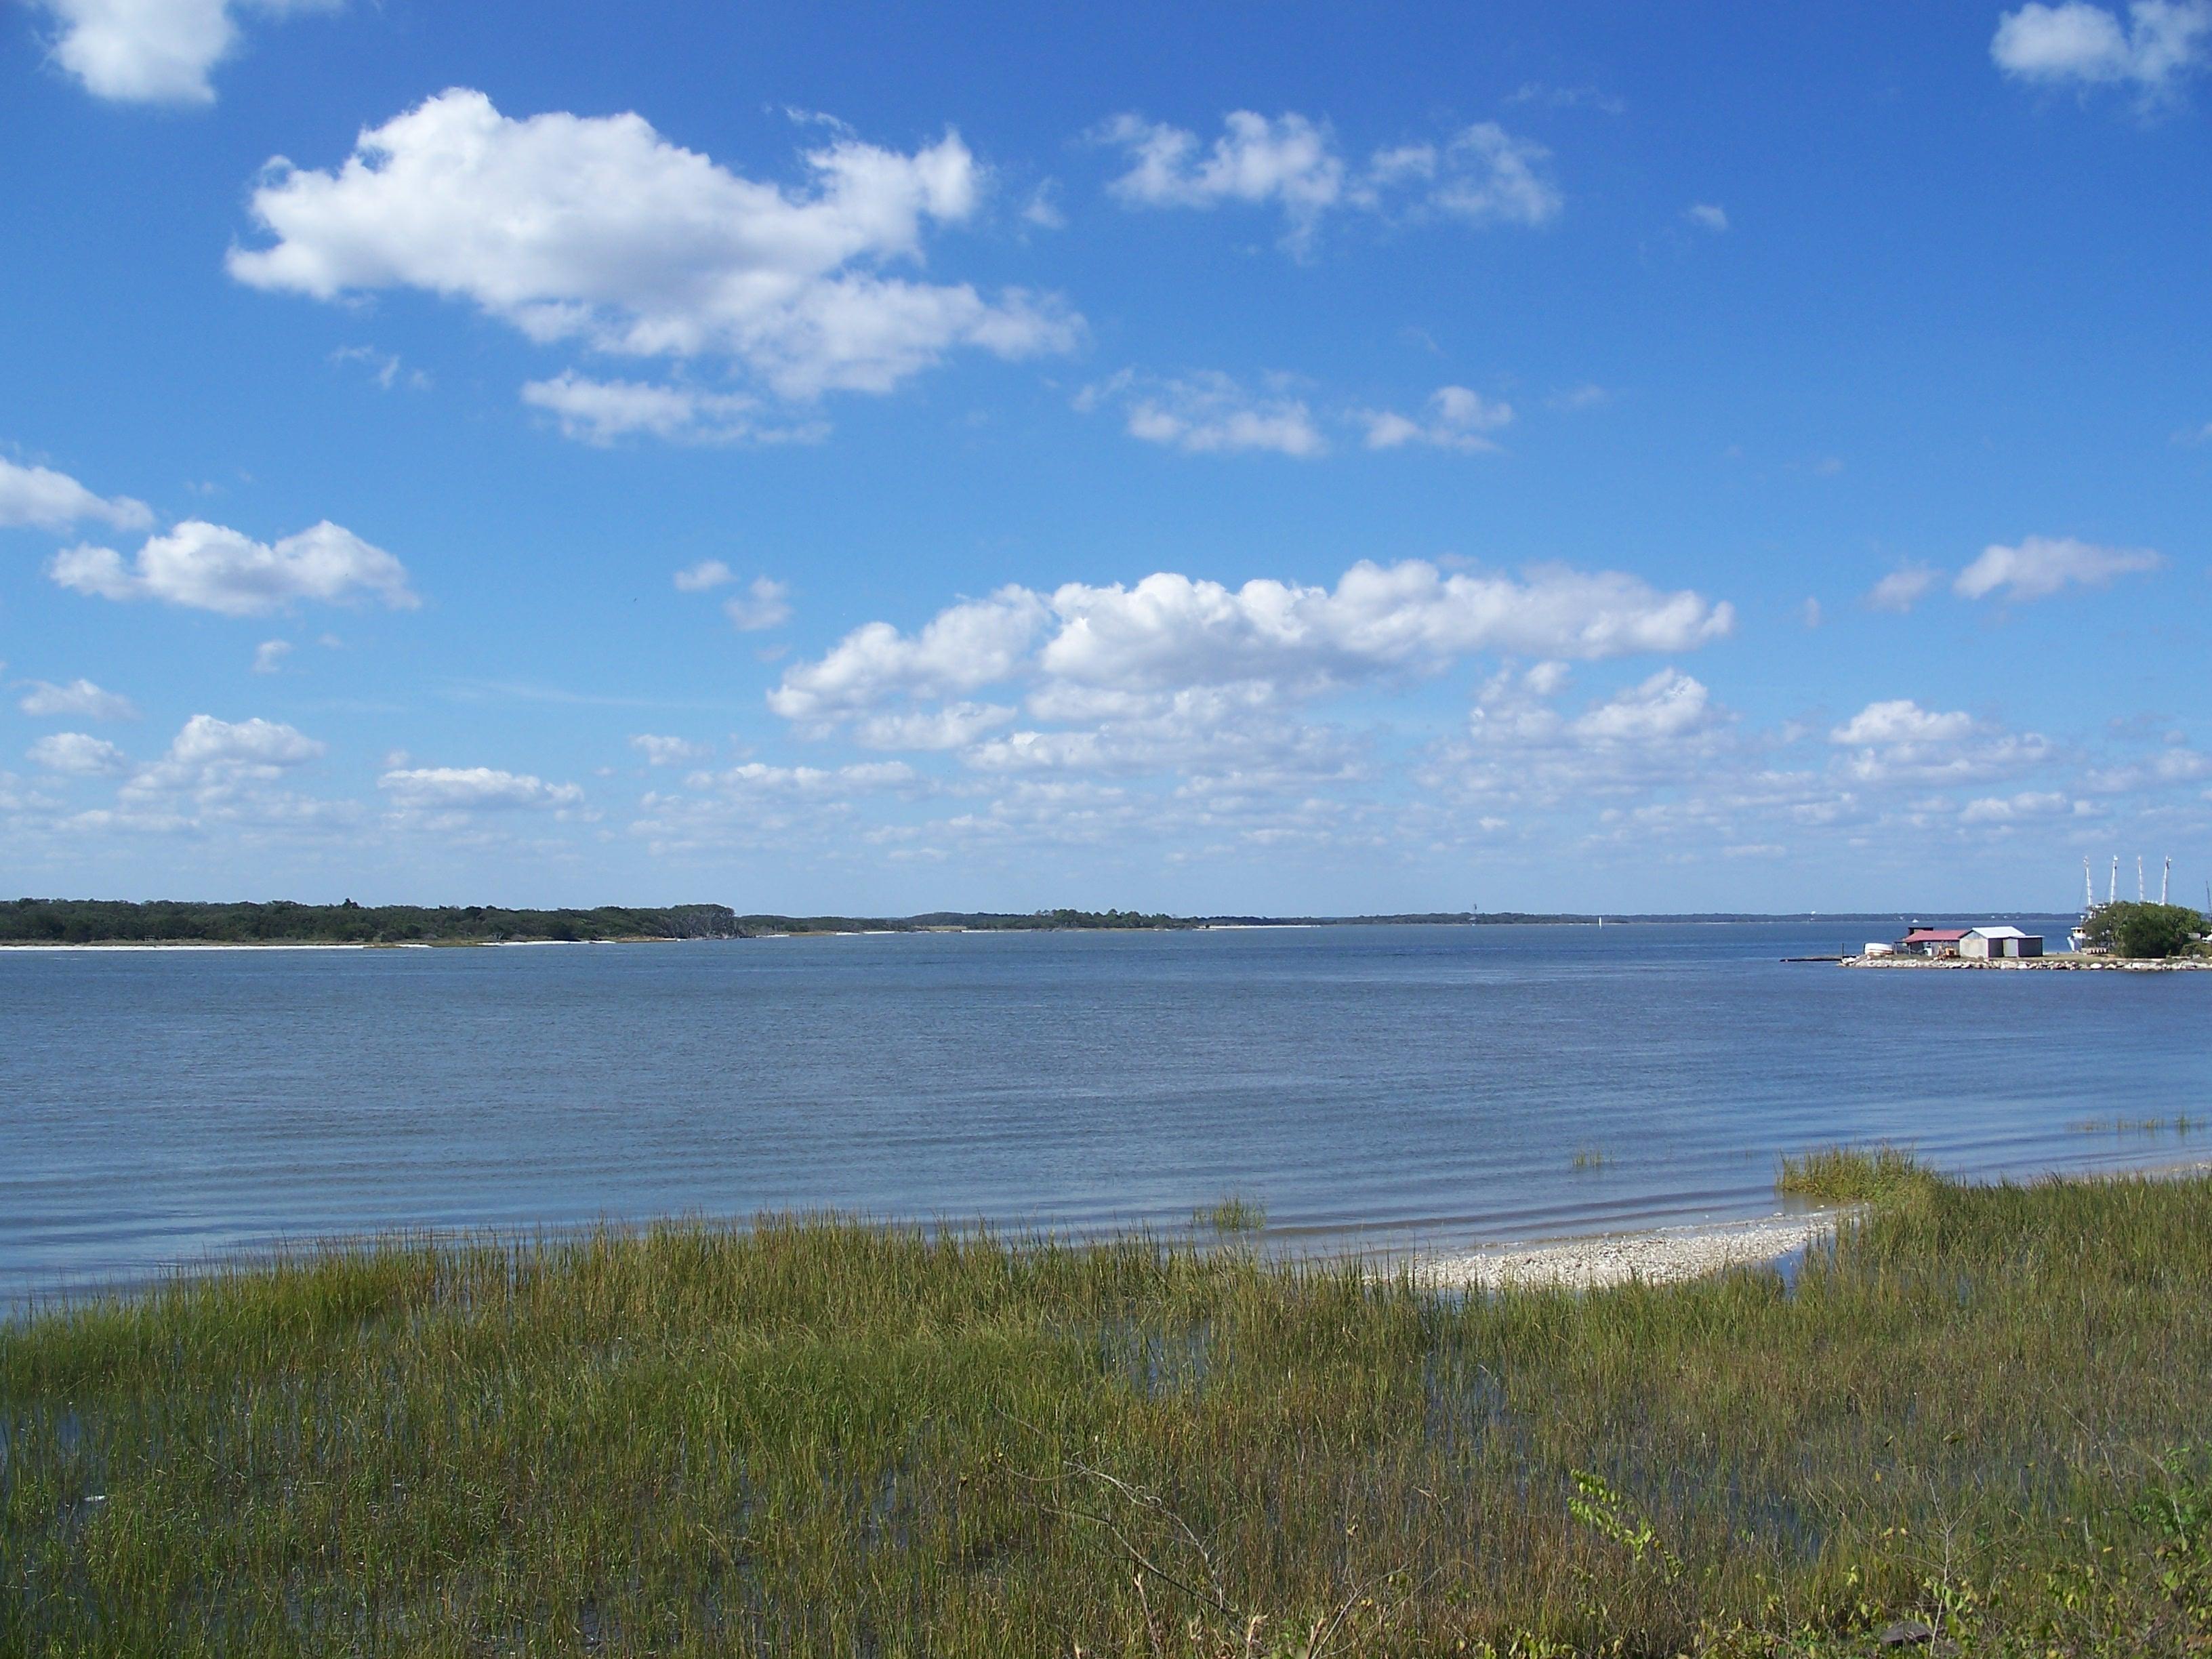 Amelia Island Florida Hotels On The Beach